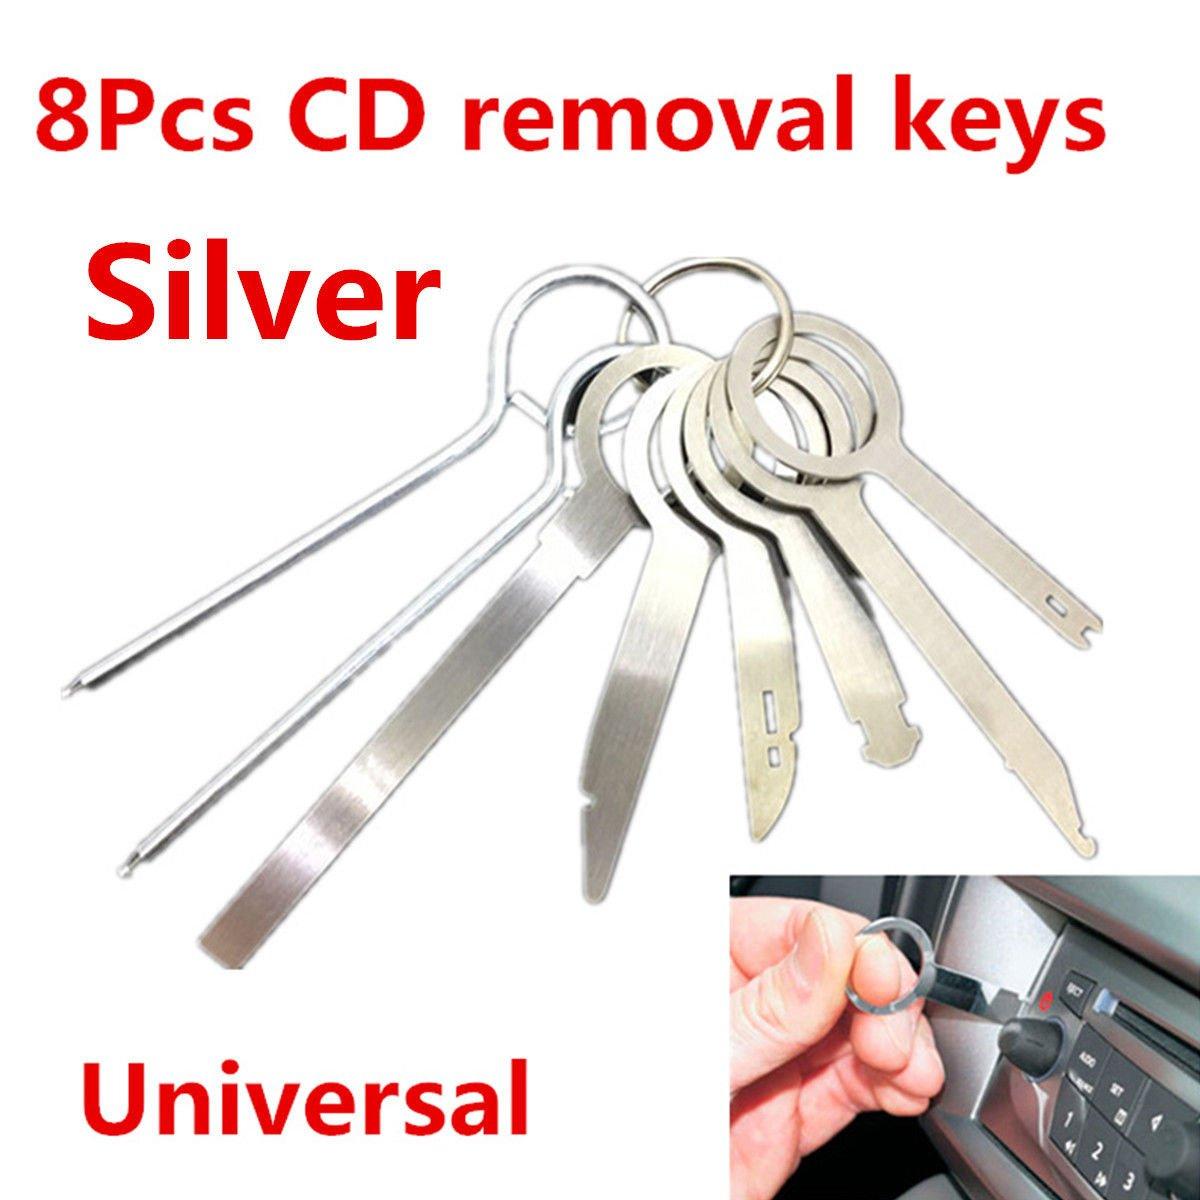 8Pcs Car Stereo CD Radio Head Unit Release Removal Key Tool Set Dash Audio Tools